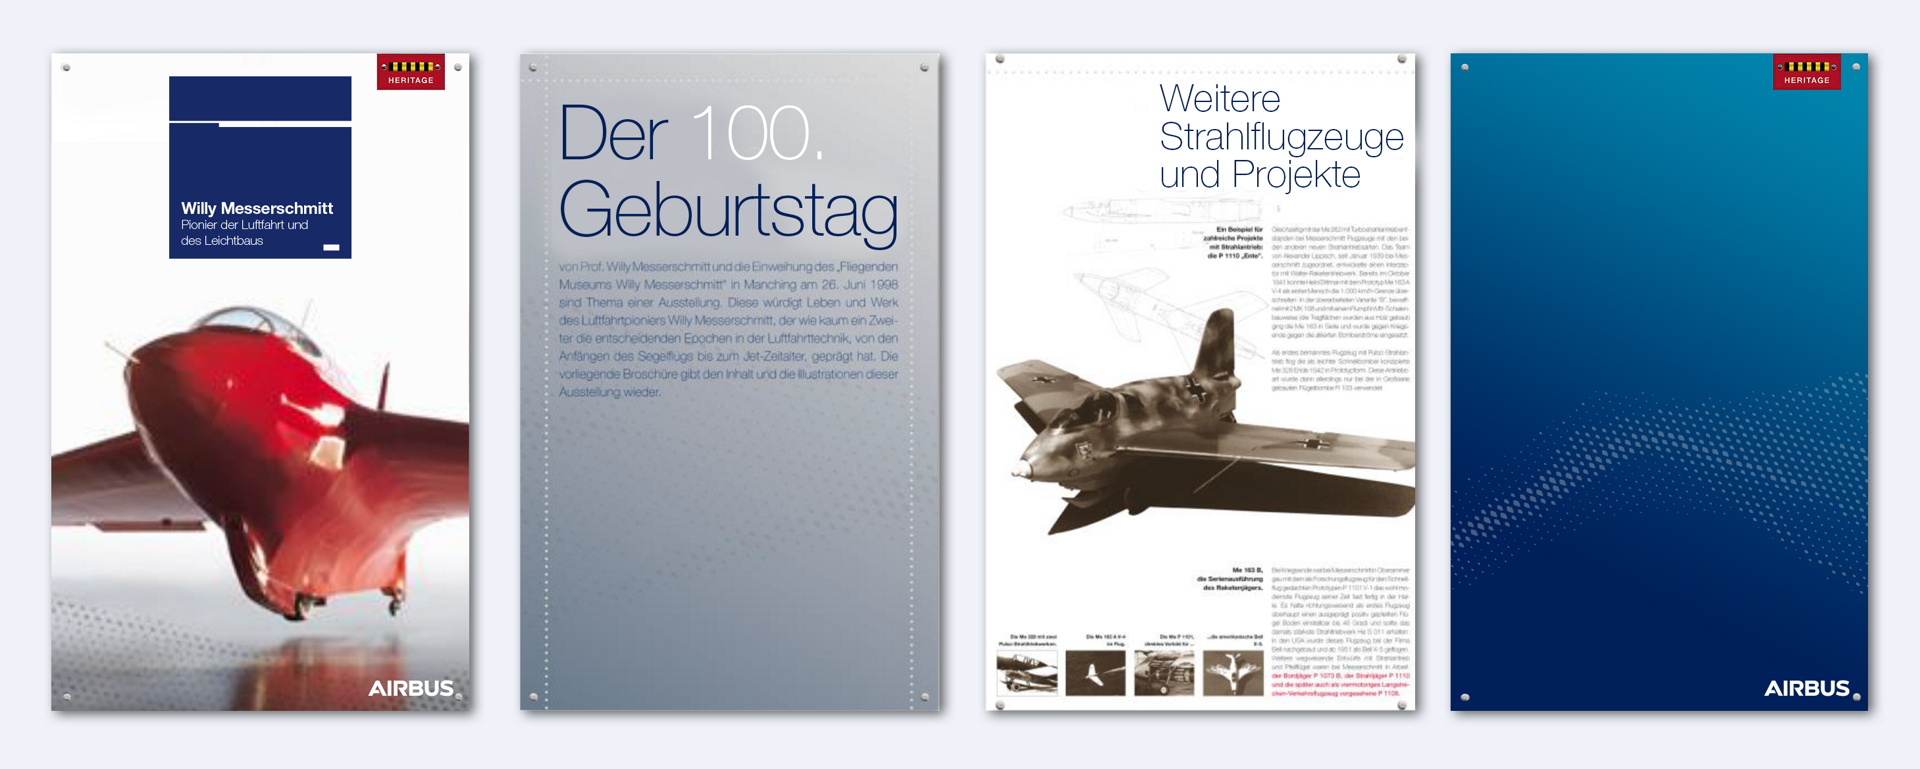 Airbus Heritage Touring Exhibition 1